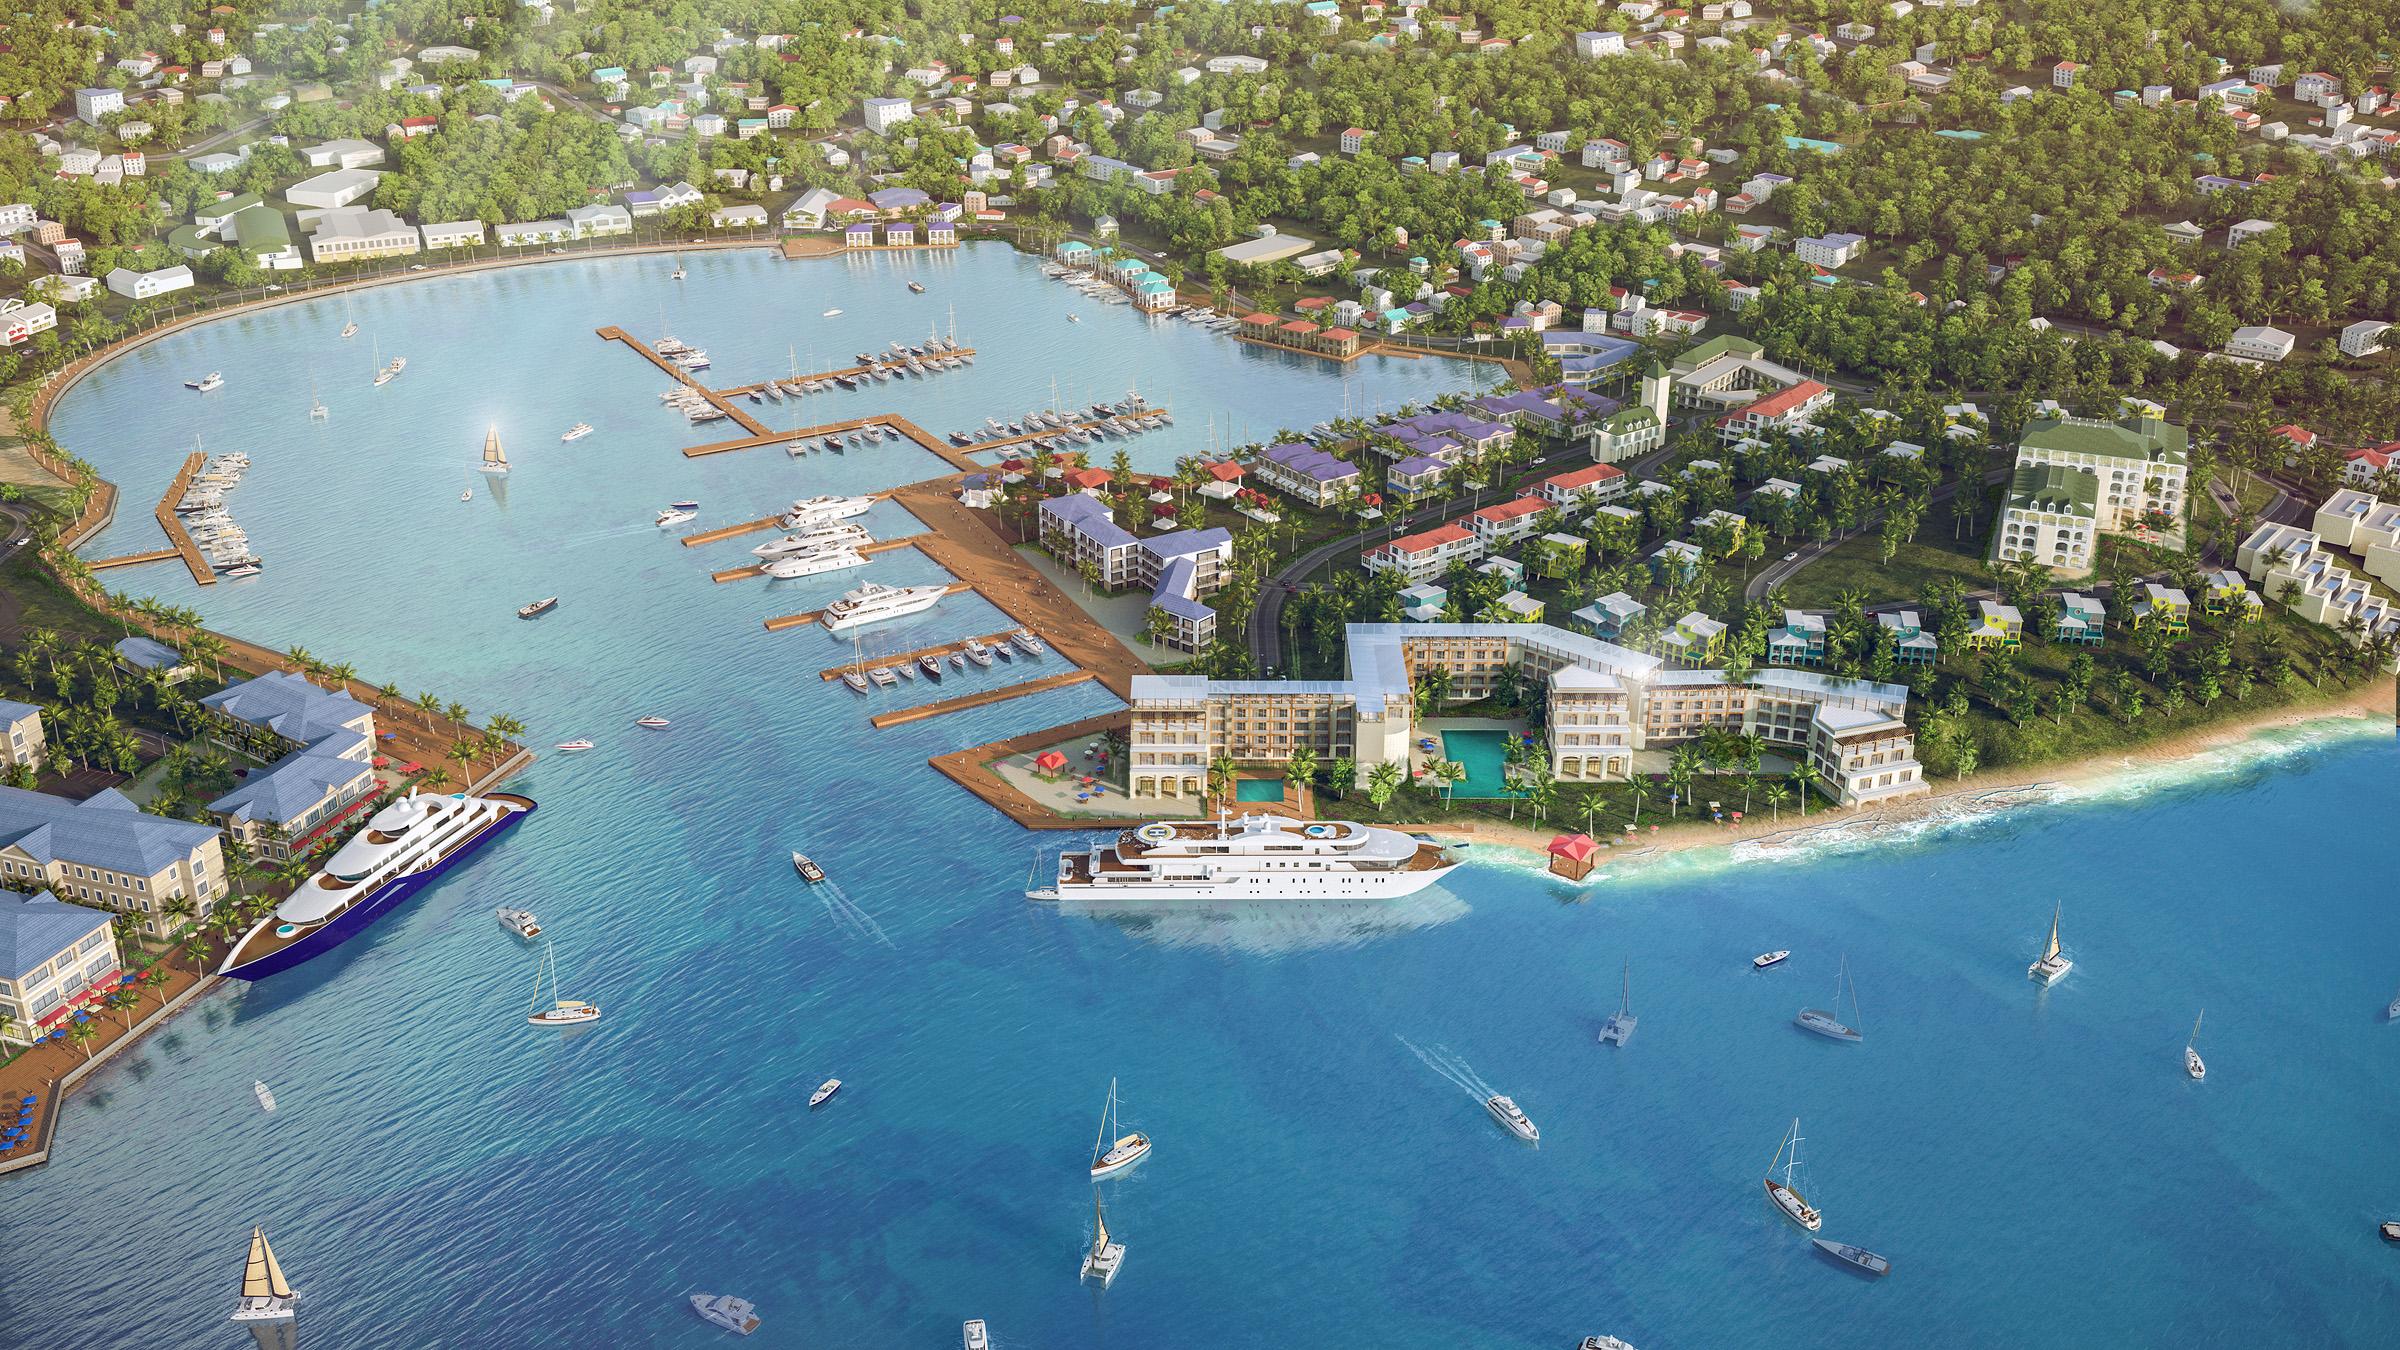 GRENADA CONCEPTUAL MASTER PLAN   St George's, Grenada |  Client: RM Strategies